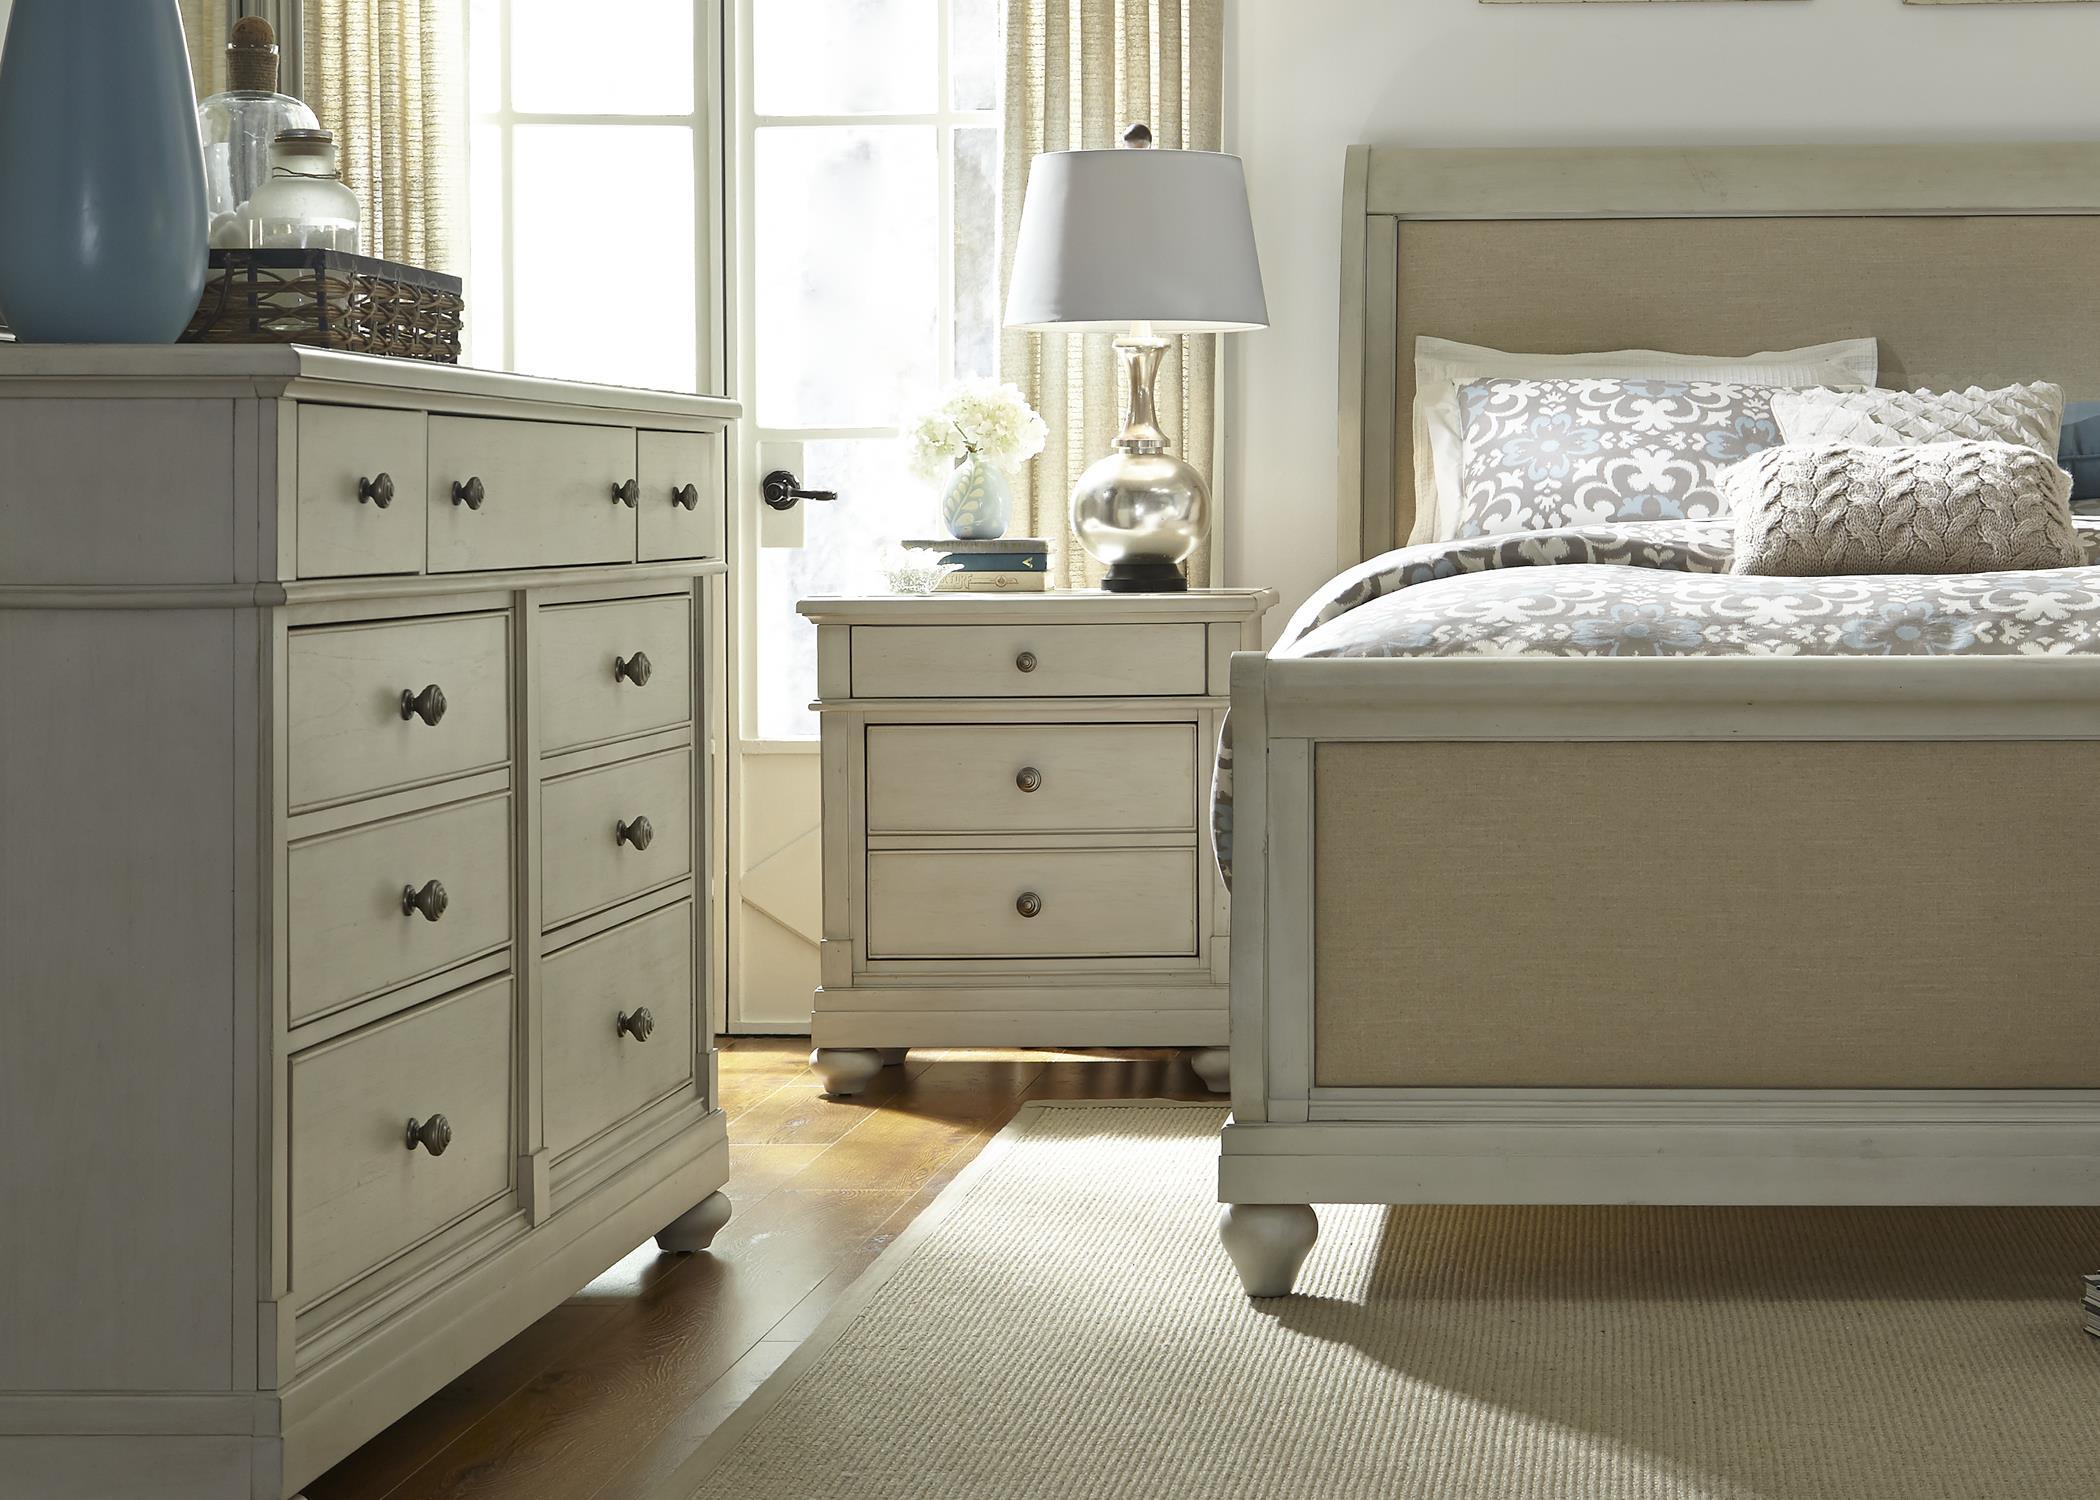 Liberty Furniture Harbor View Queen Bedroom Group - Item Number: 731-BR-QSLDMN